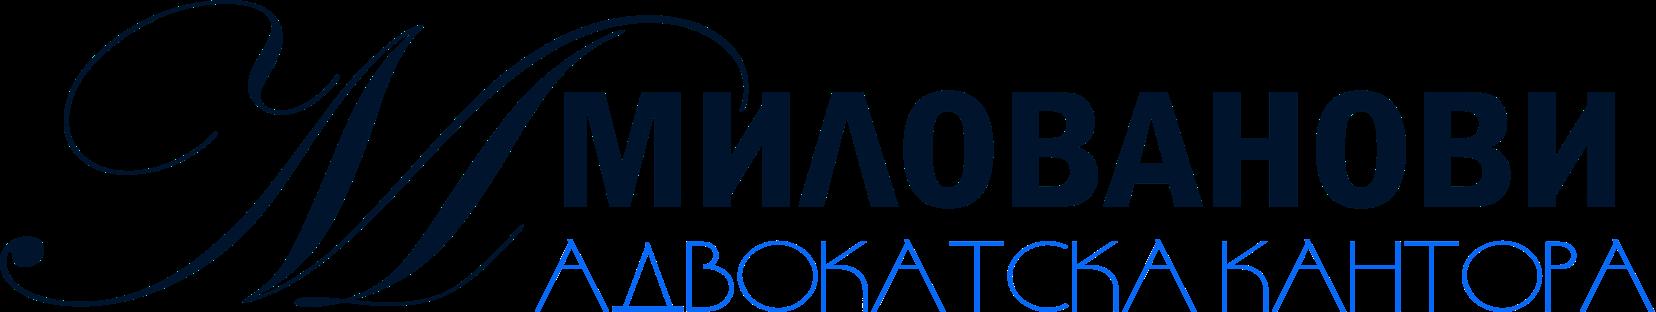 ivuworks